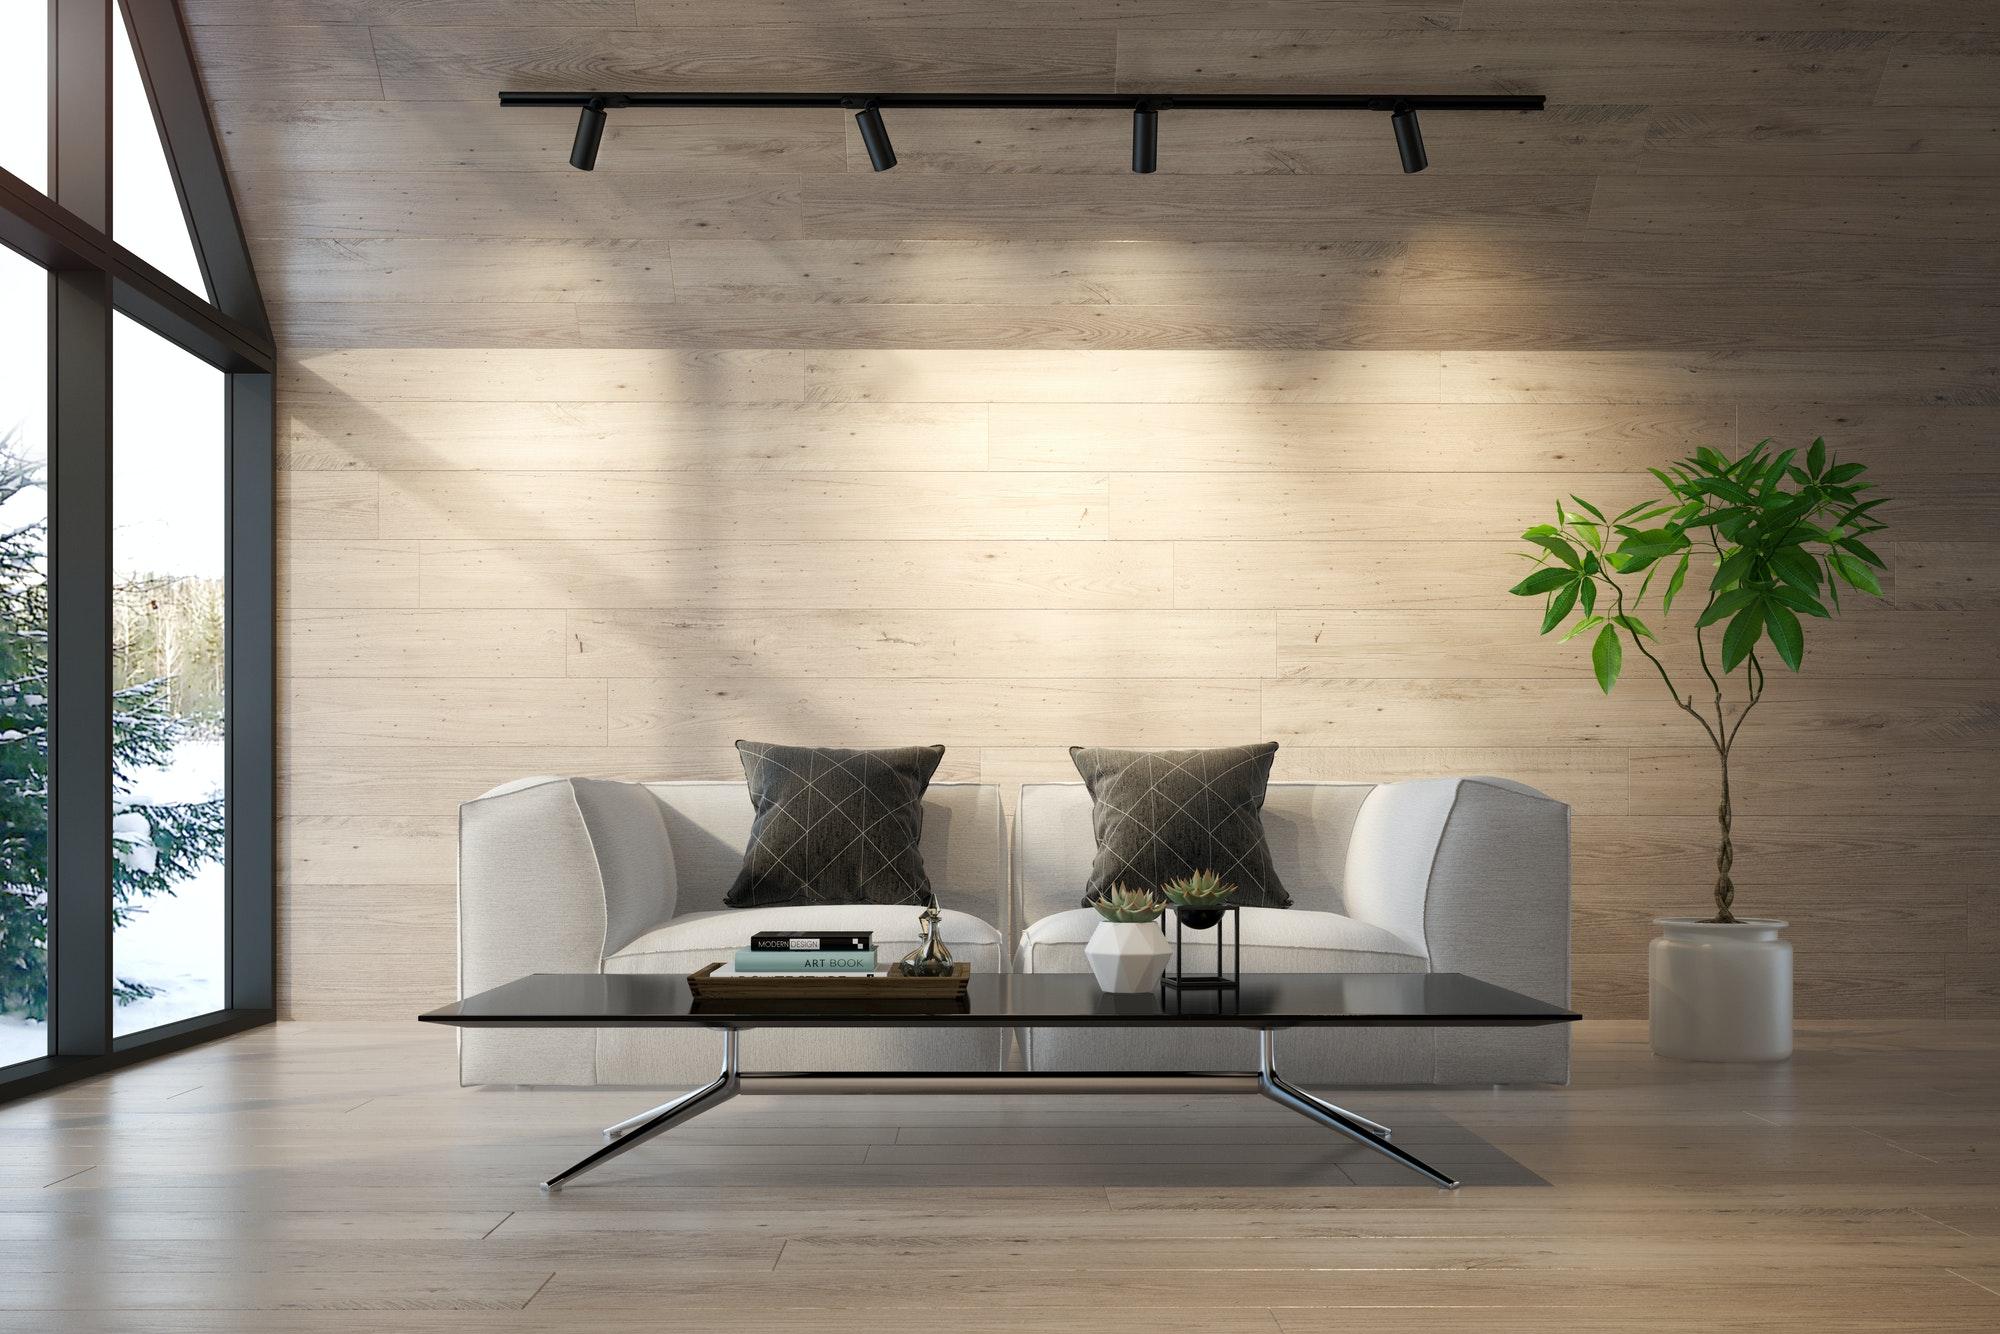 Decoración Viviendas Interior living room of a forest house 3D rendering